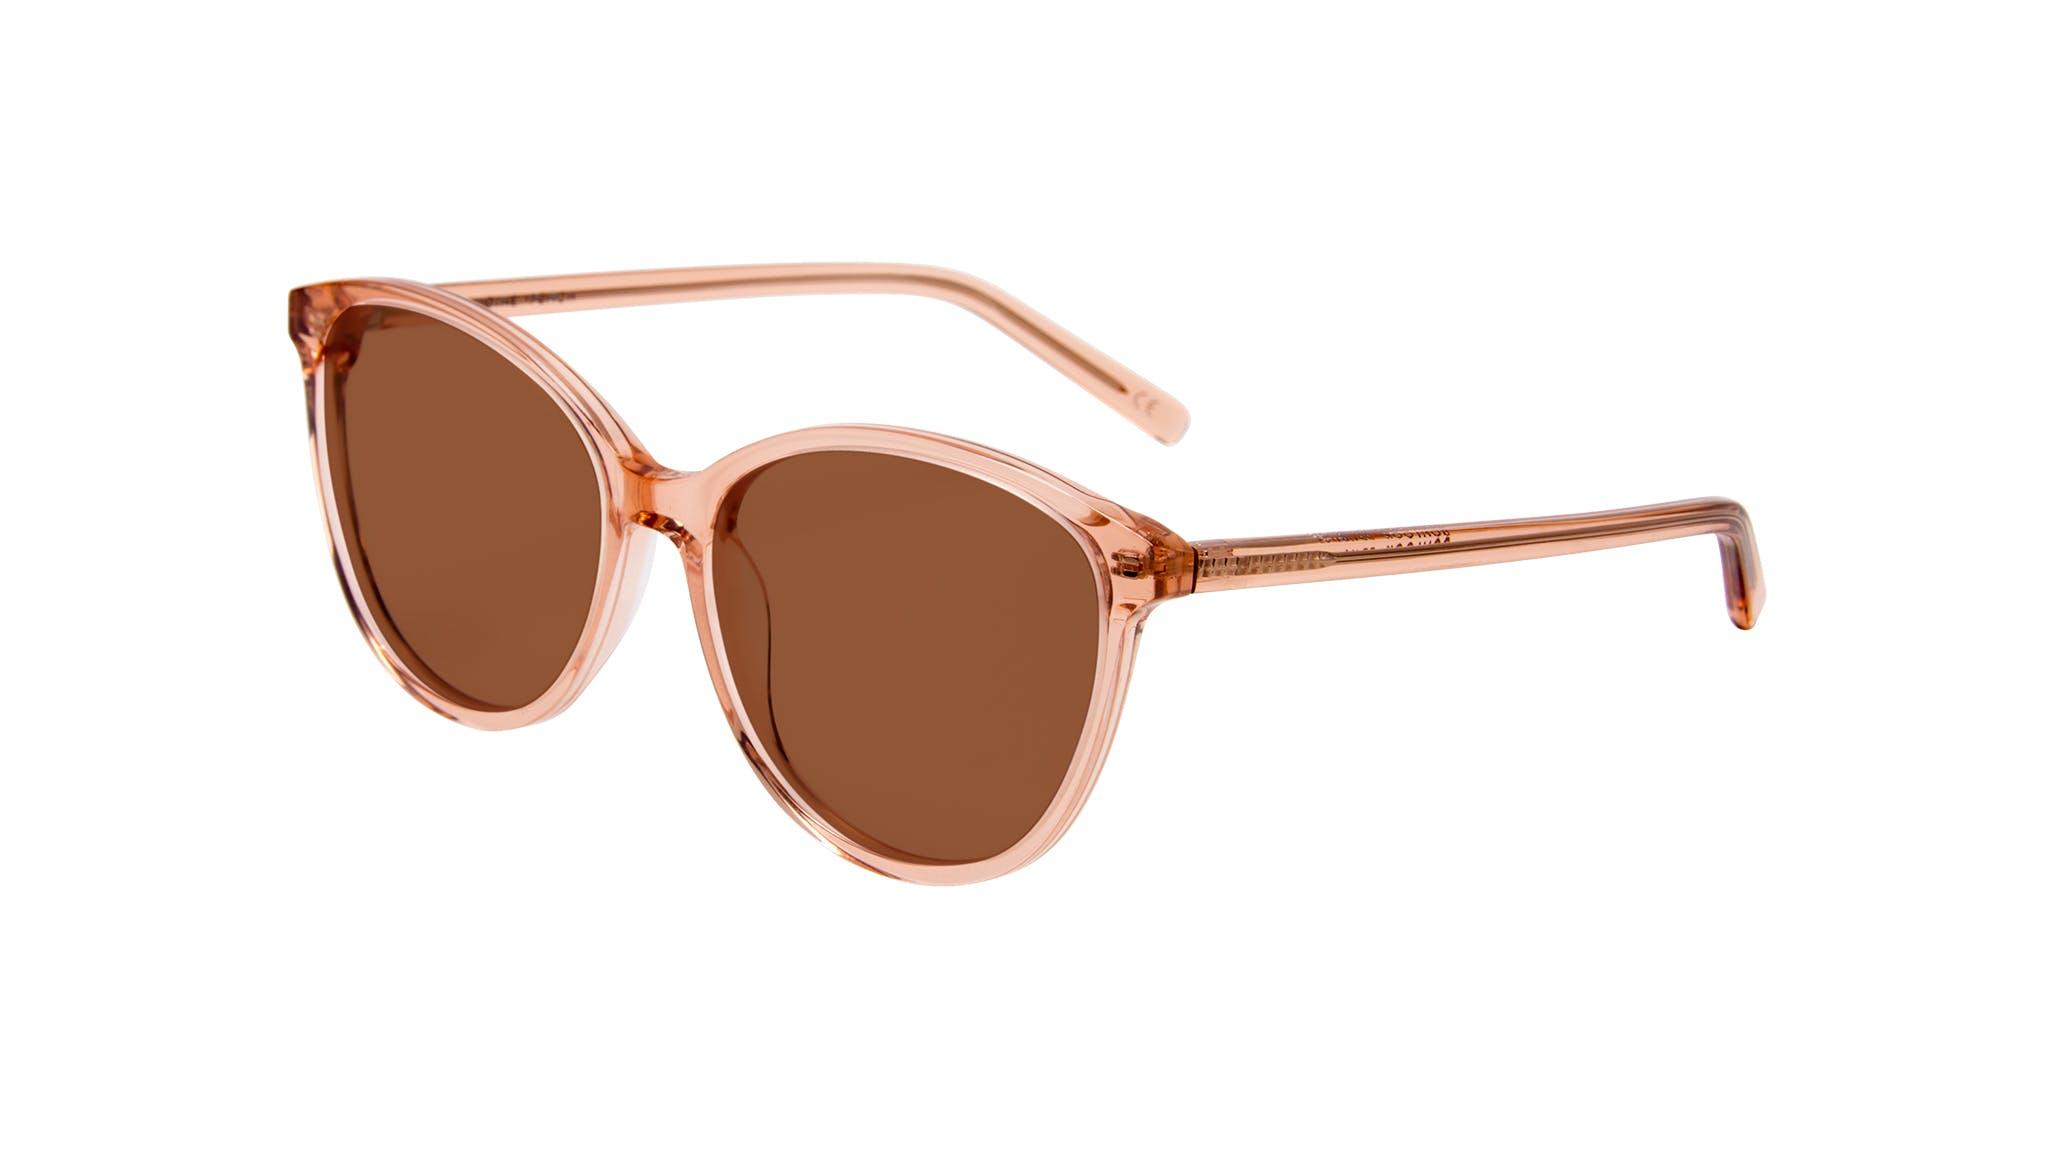 Affordable Fashion Glasses Cat Eye Round Sunglasses Women Imagine Peach Tilt